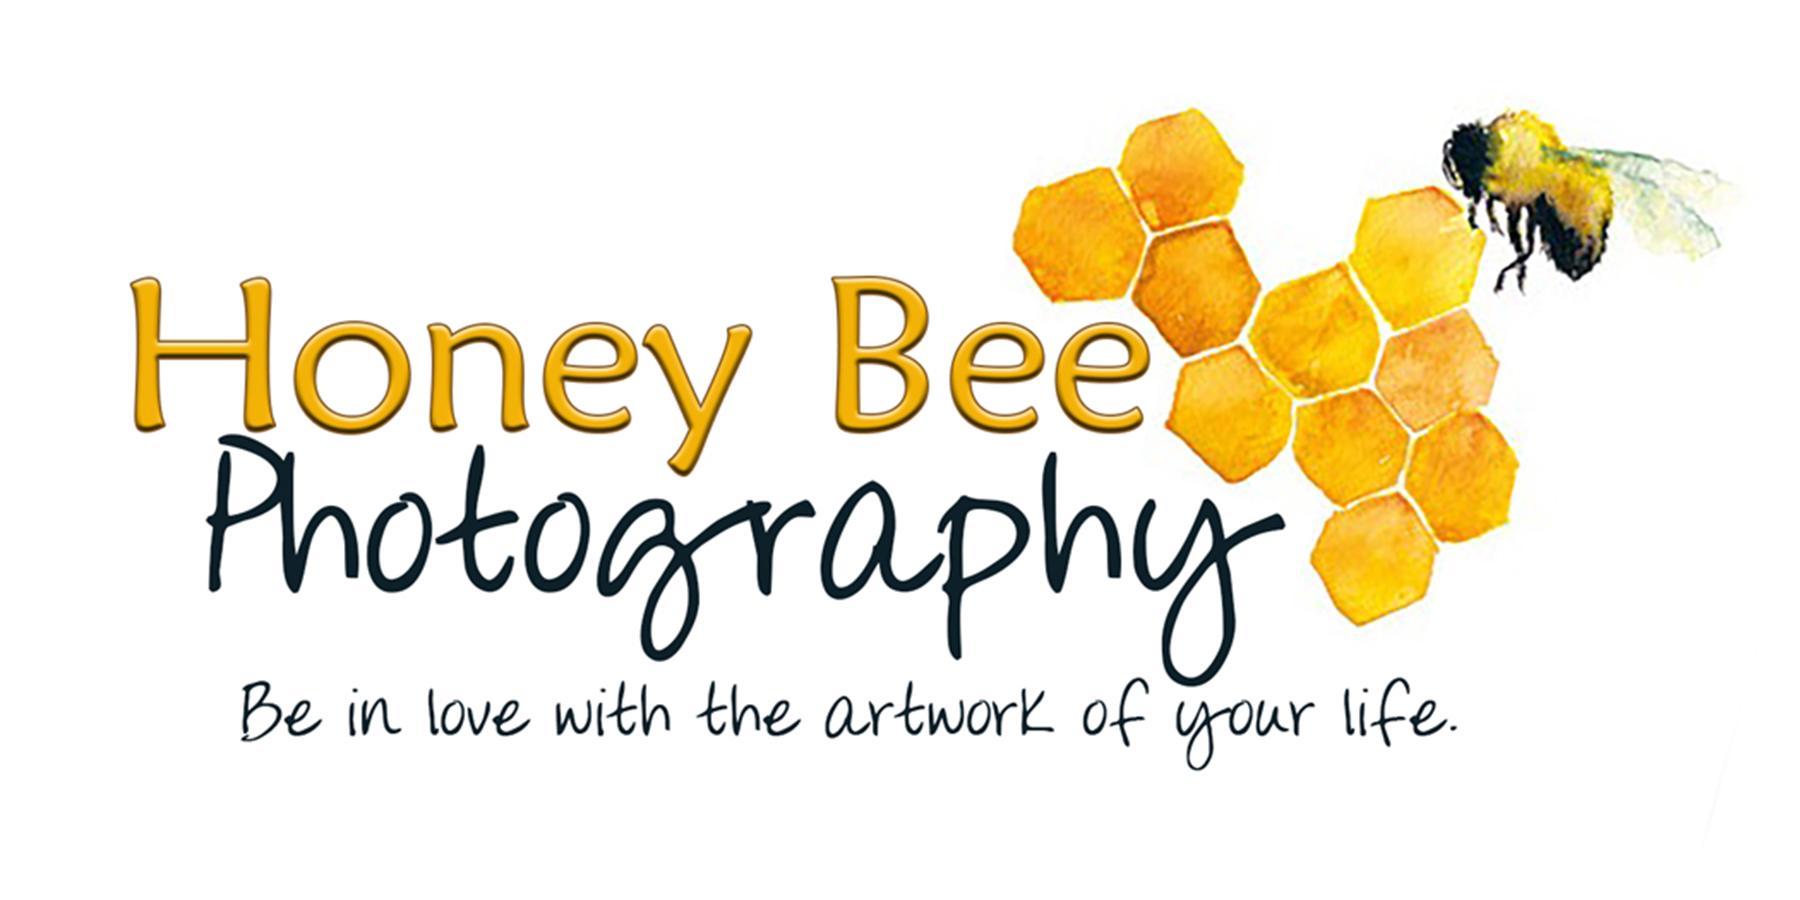 3x6 honeycomb logo tagline.jpg